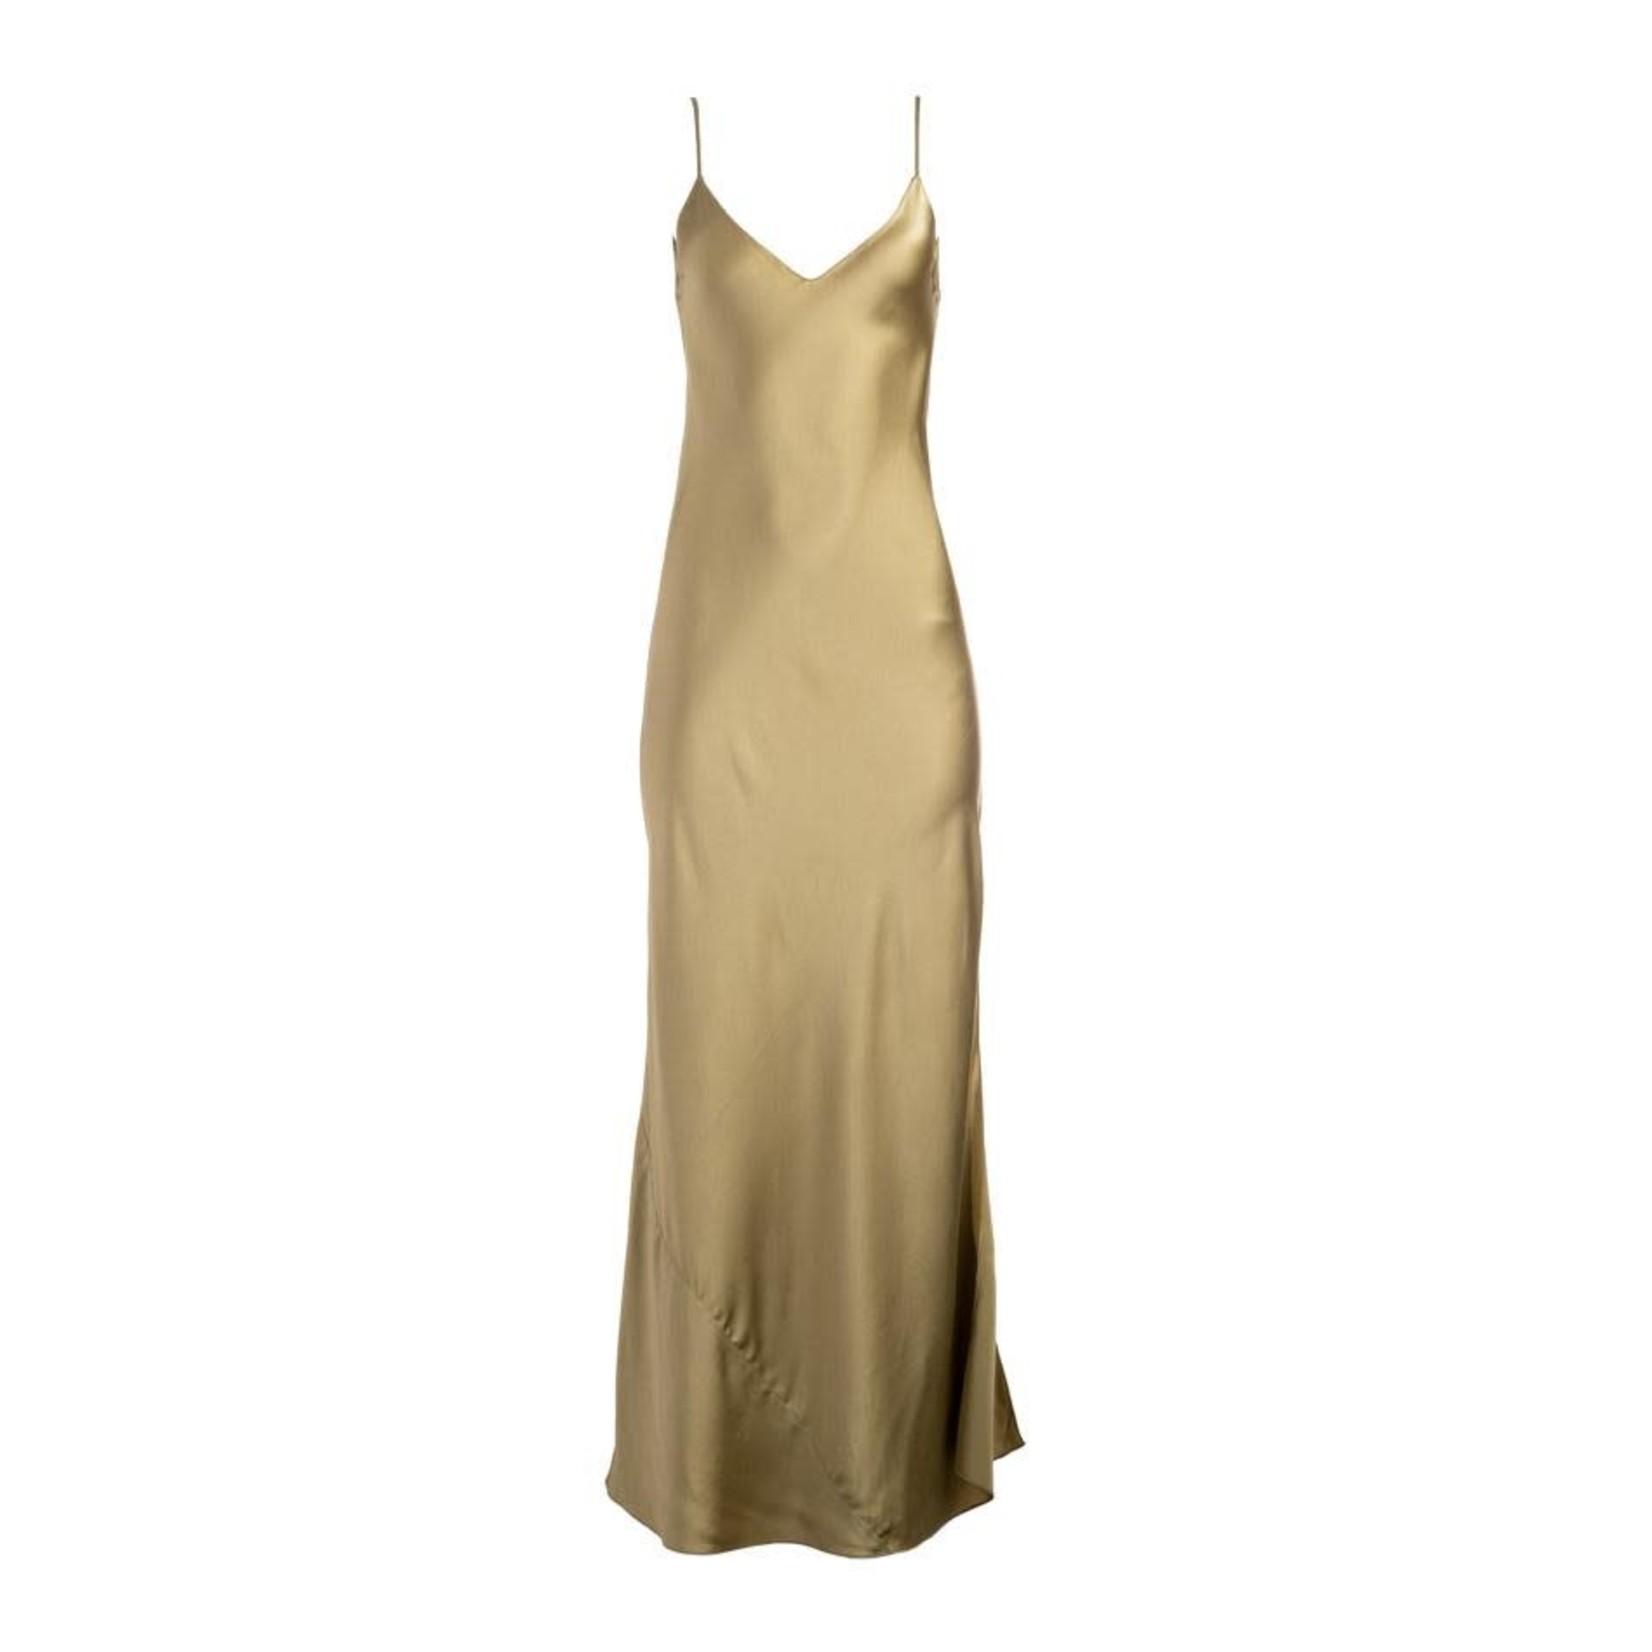 Dannijo Khaki Long Slip Dress